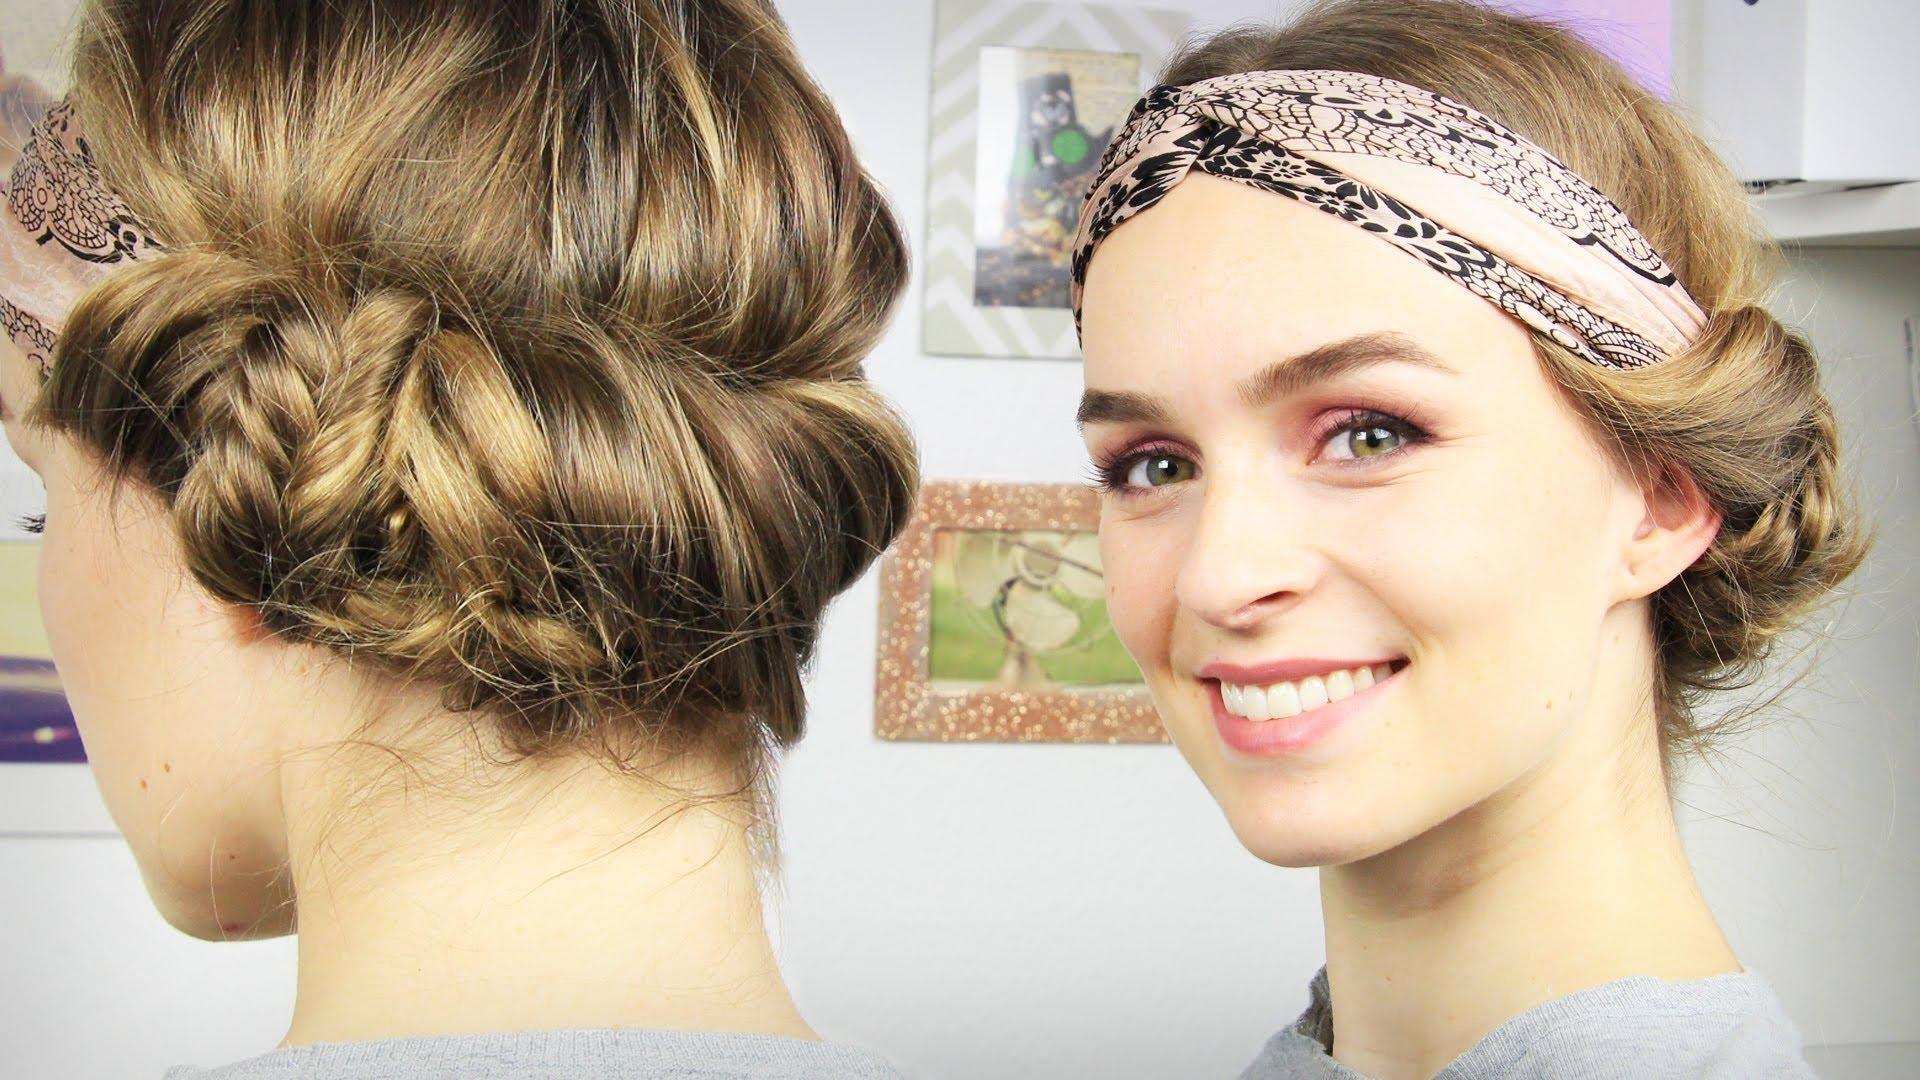 Haarband Richtig Tragen Kurze Haare Modische Frisuren 2018